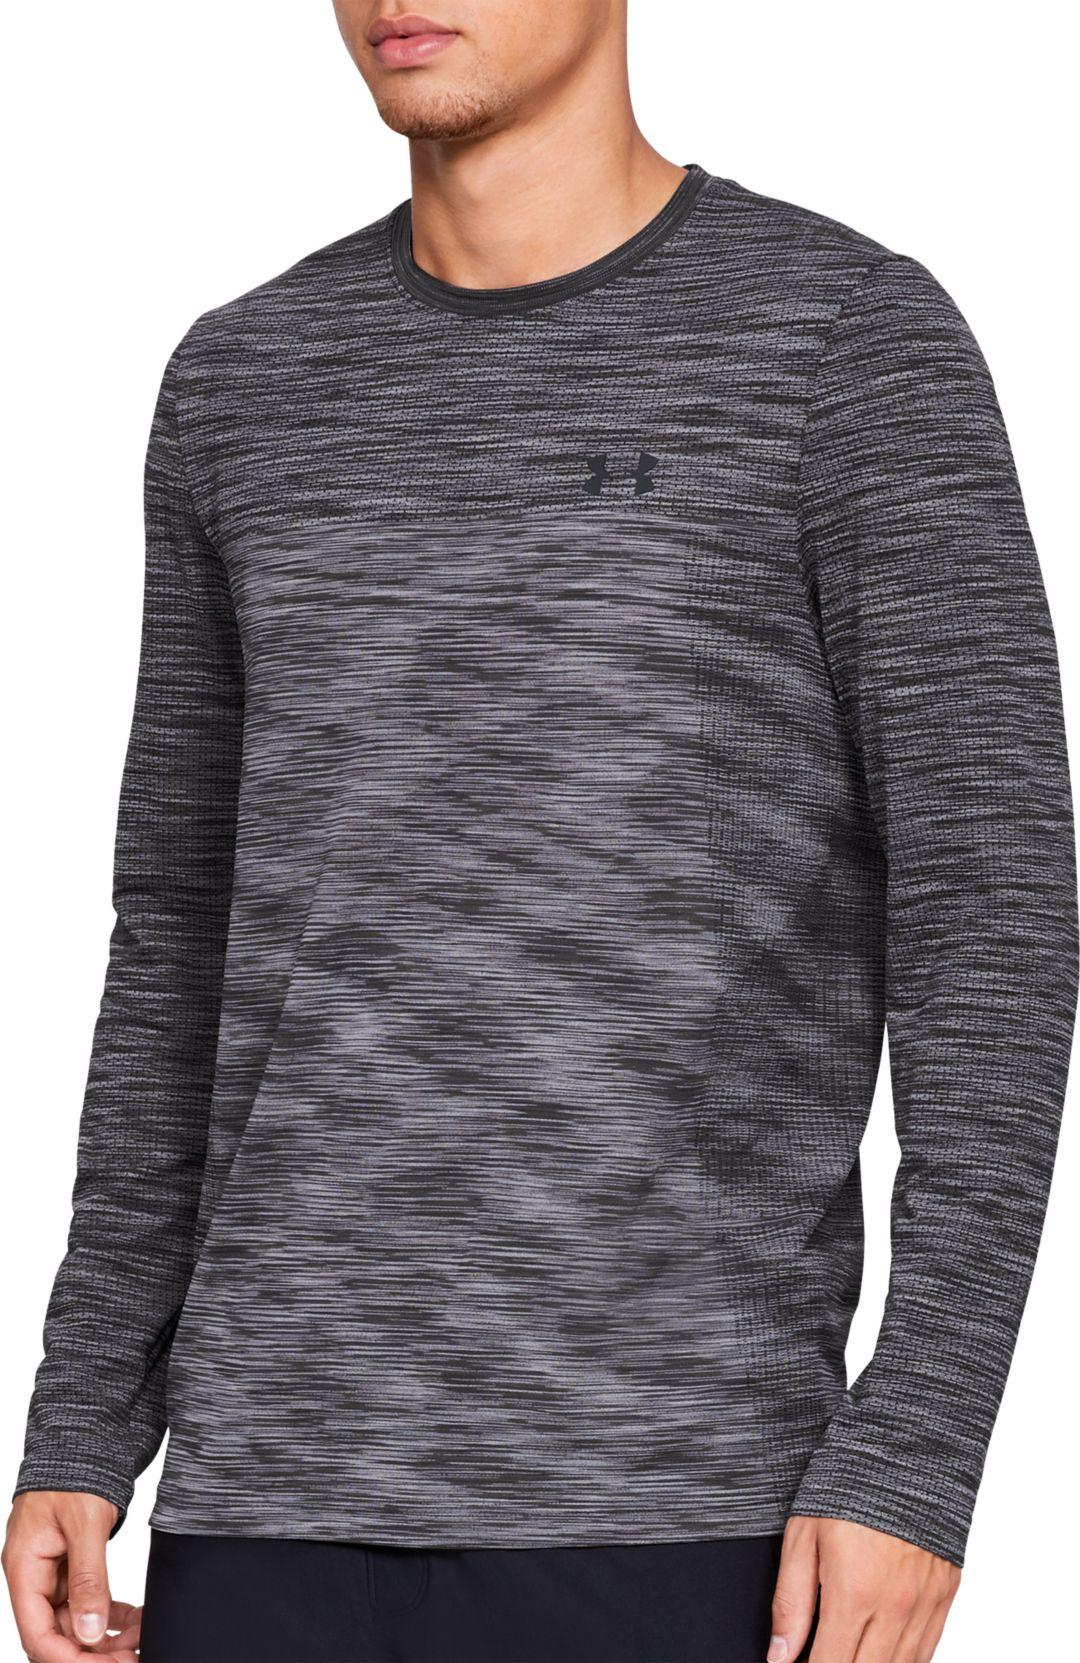 625c341a44 Under Armour Men's Vanish Seamless Long Sleeve Shirt